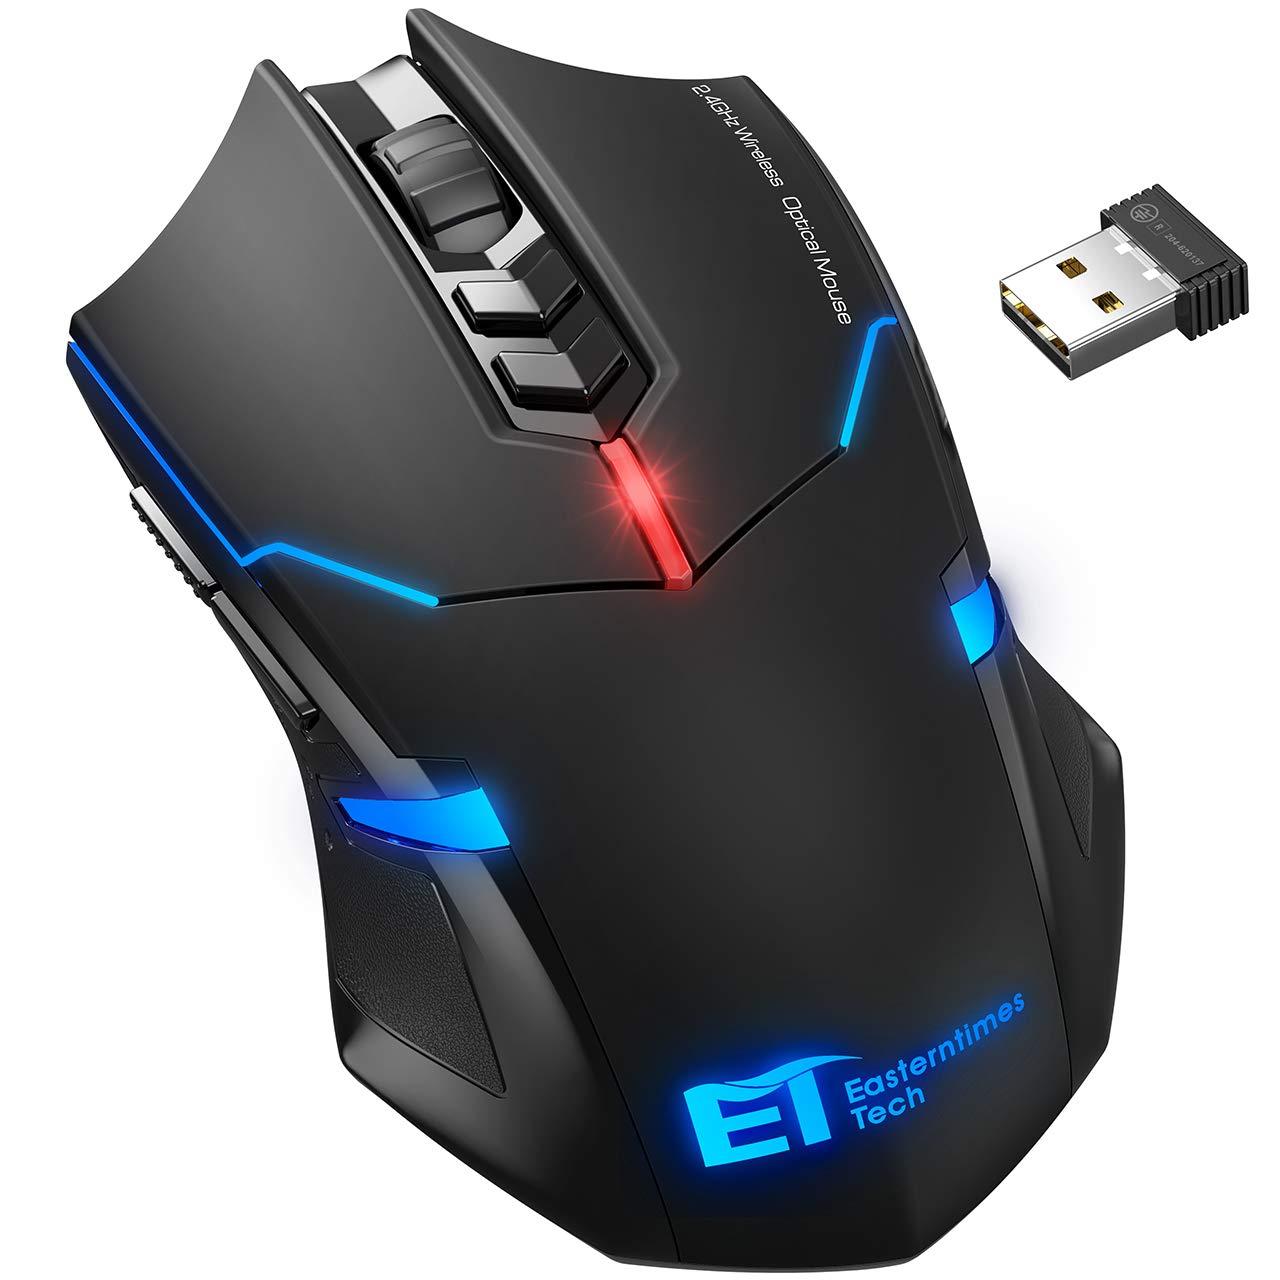 Qtuo ワイヤレス マウス ゲーミングマウス 2.4G ゲーマーマウス 超静音 5段階DPI調整可能 省電力 LEDライト 無線 ゲームマウス(ブラック)